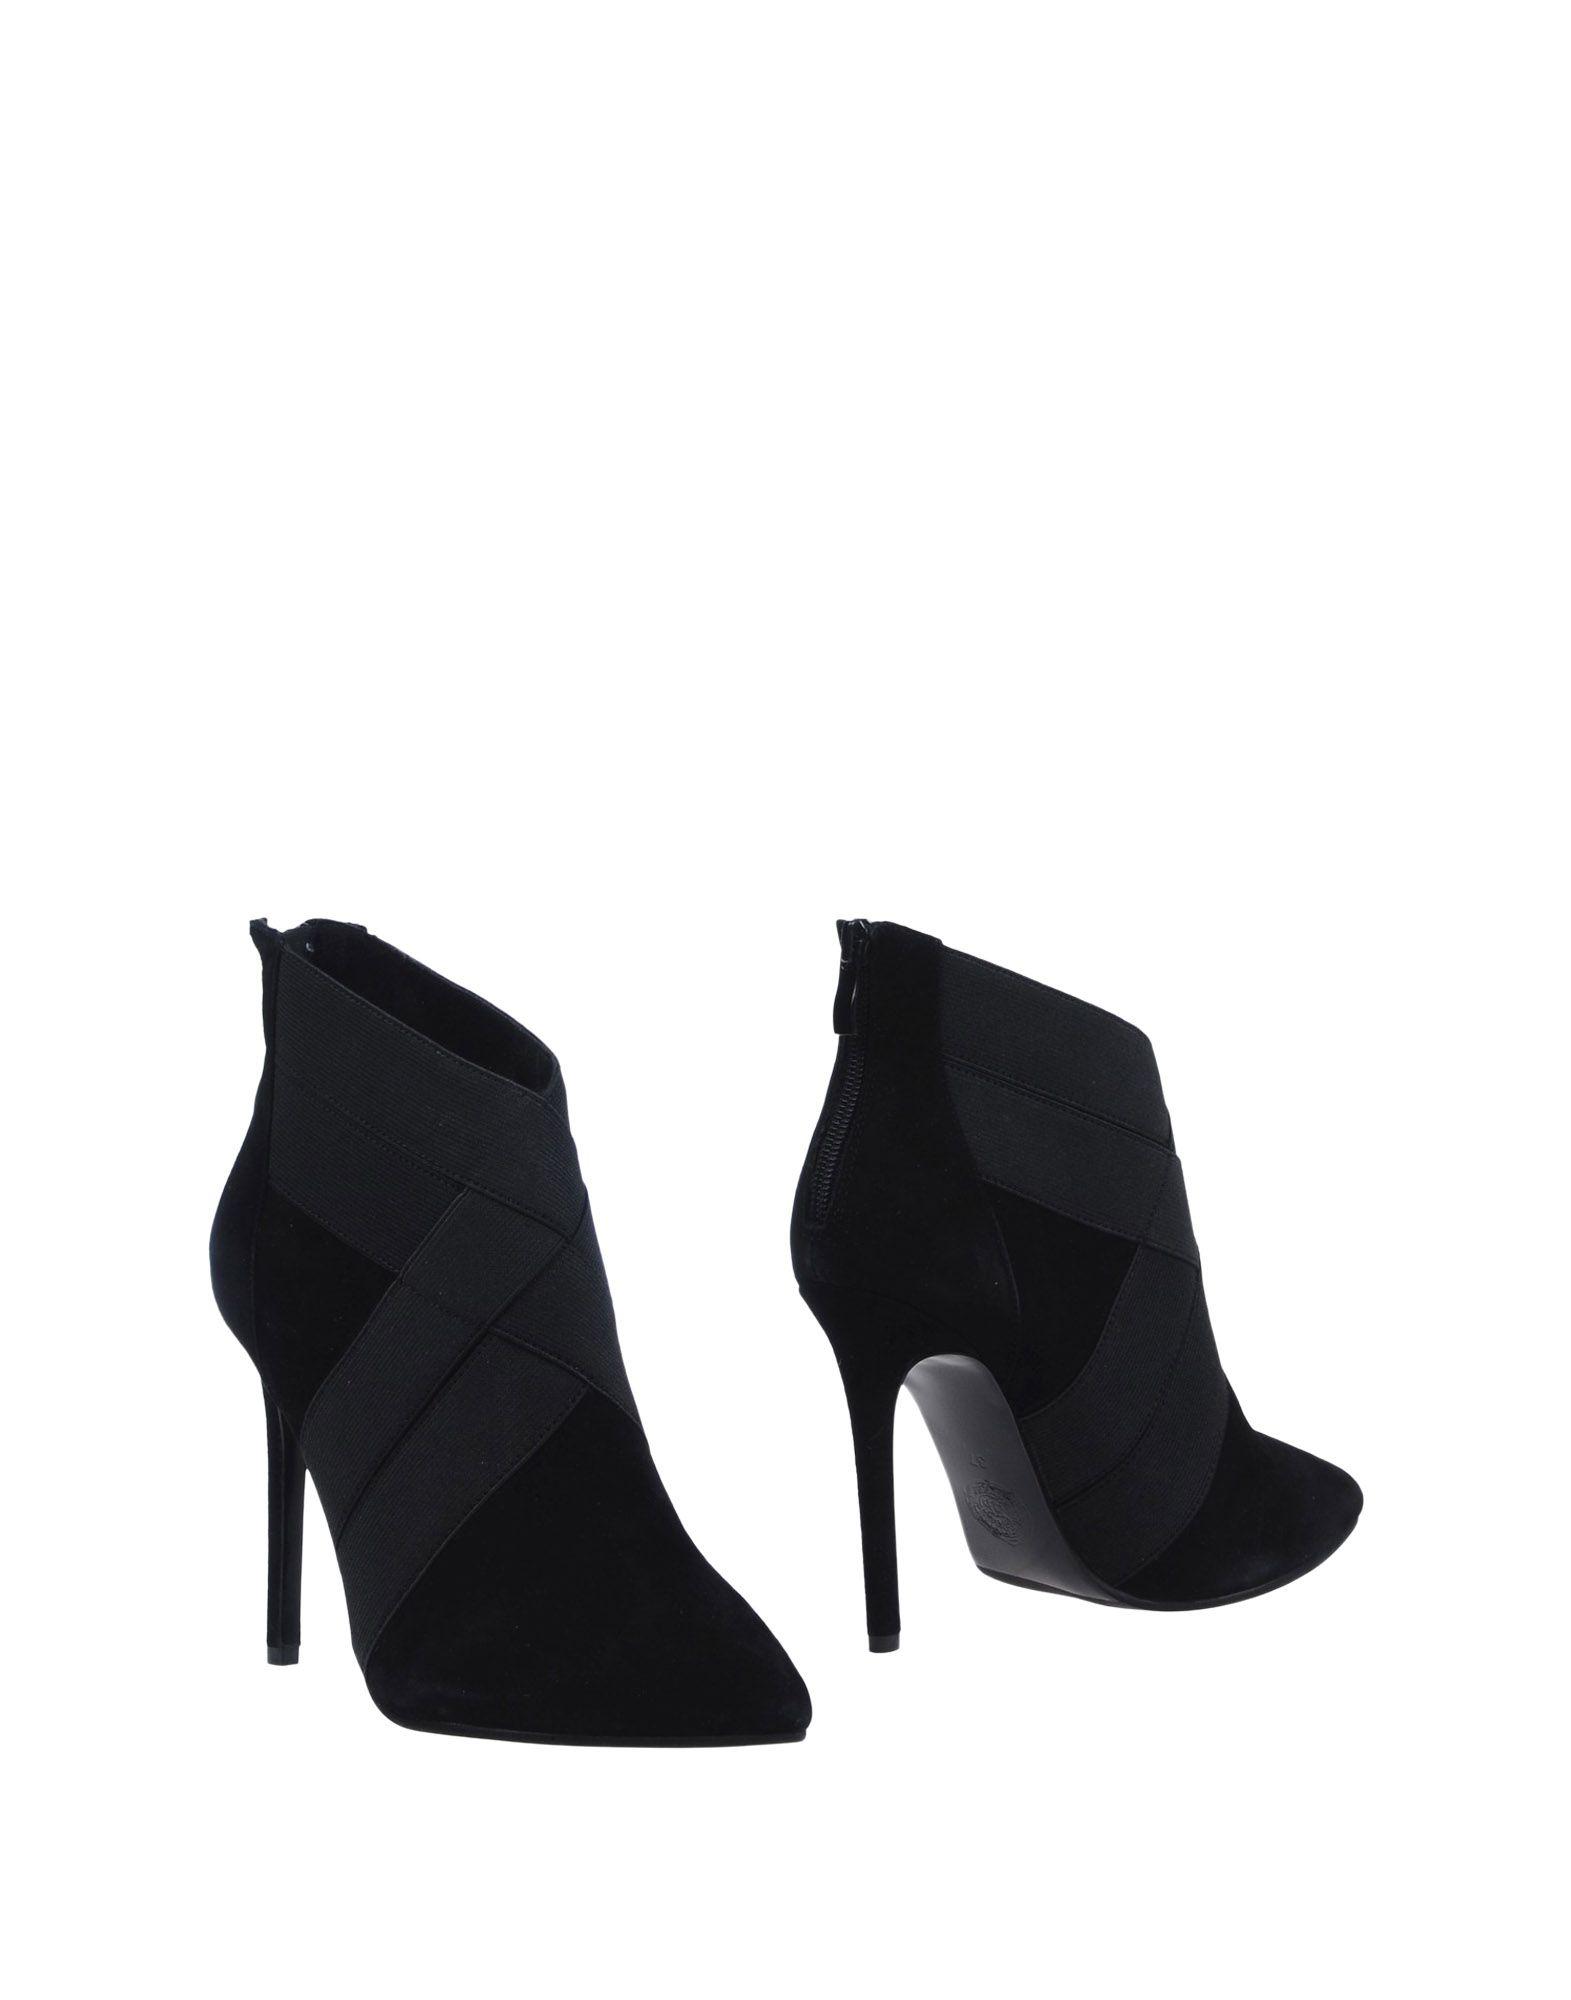 Stilvolle billige Schuhe Scervino Street Stiefelette Damen Damen Stiefelette  11237261XG 72728d